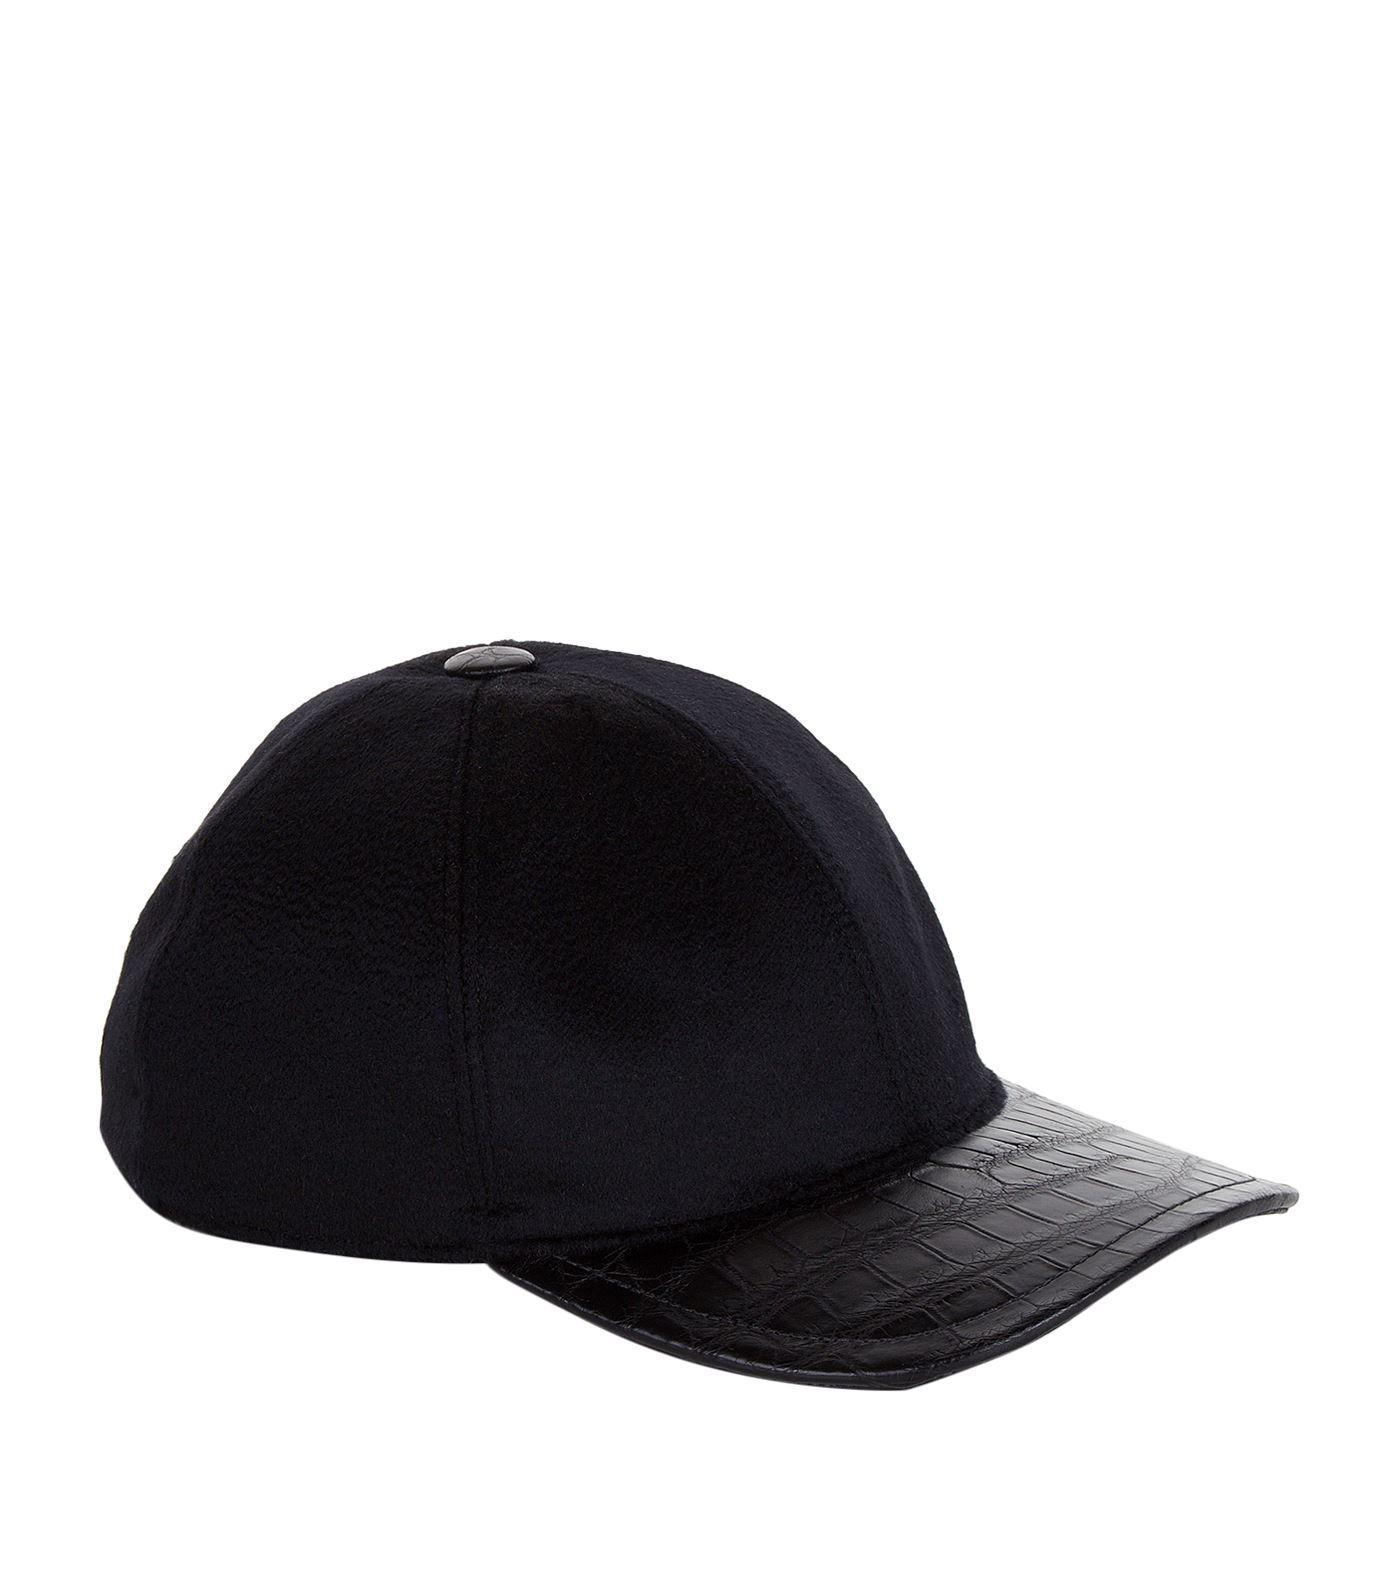 Lyst - Stefano Ricci Cashmere And Crocodile Skin Cap in Black for Men a9cea2331a03